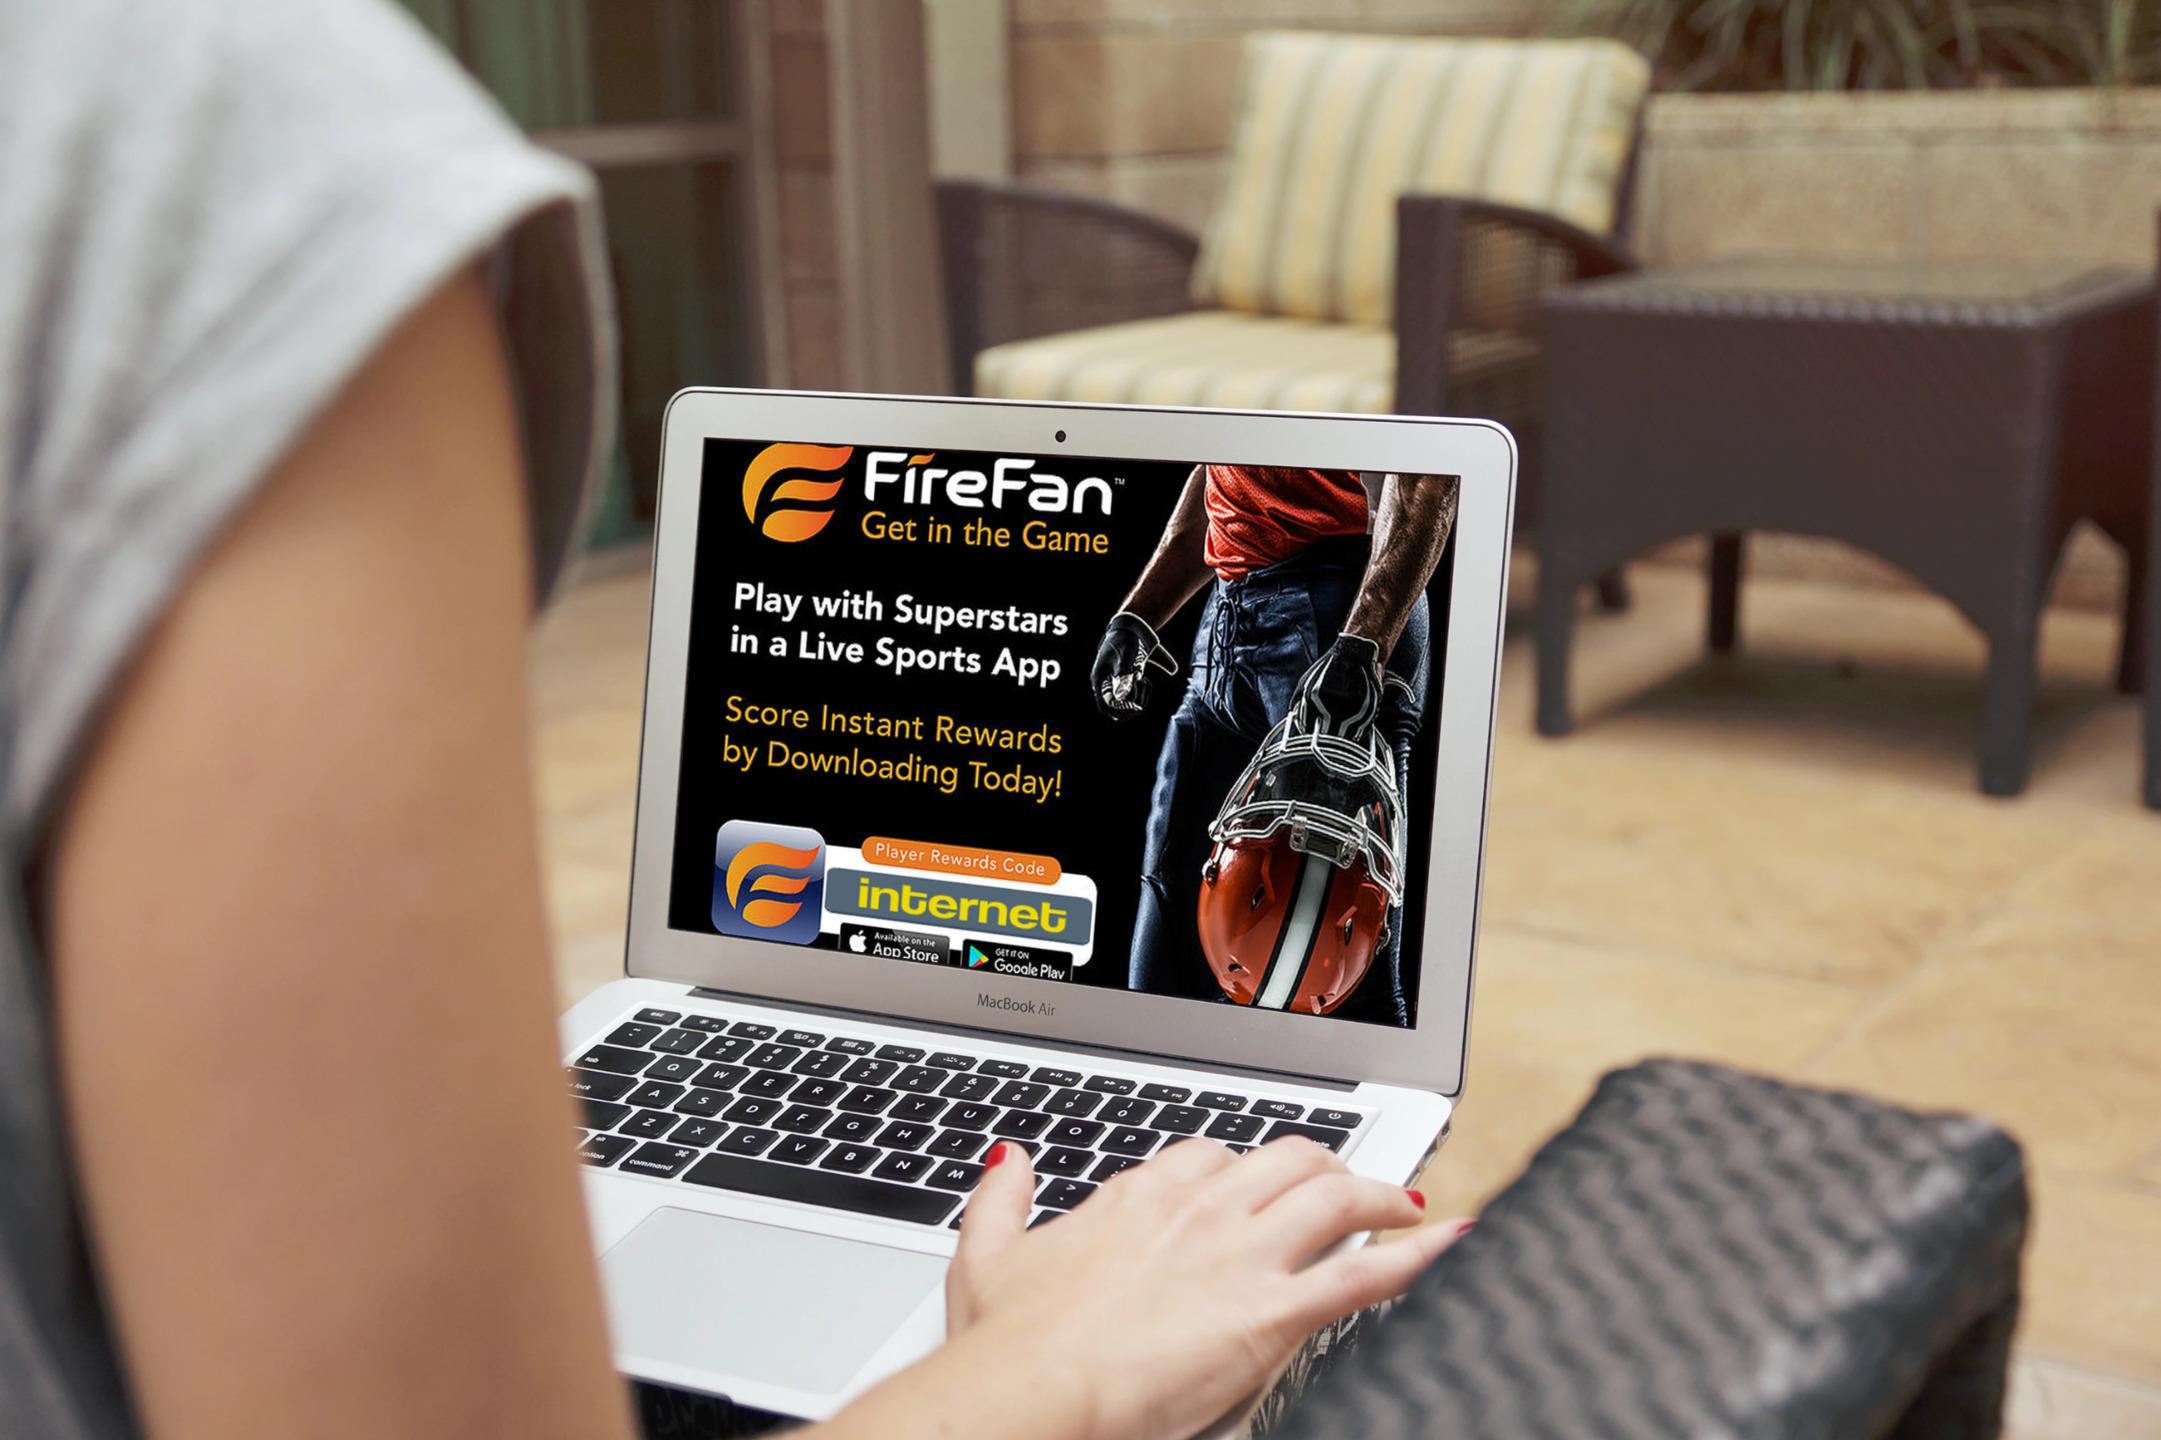 https://www.firefan.com/?code=internet (@ivsprasad) Cover Image